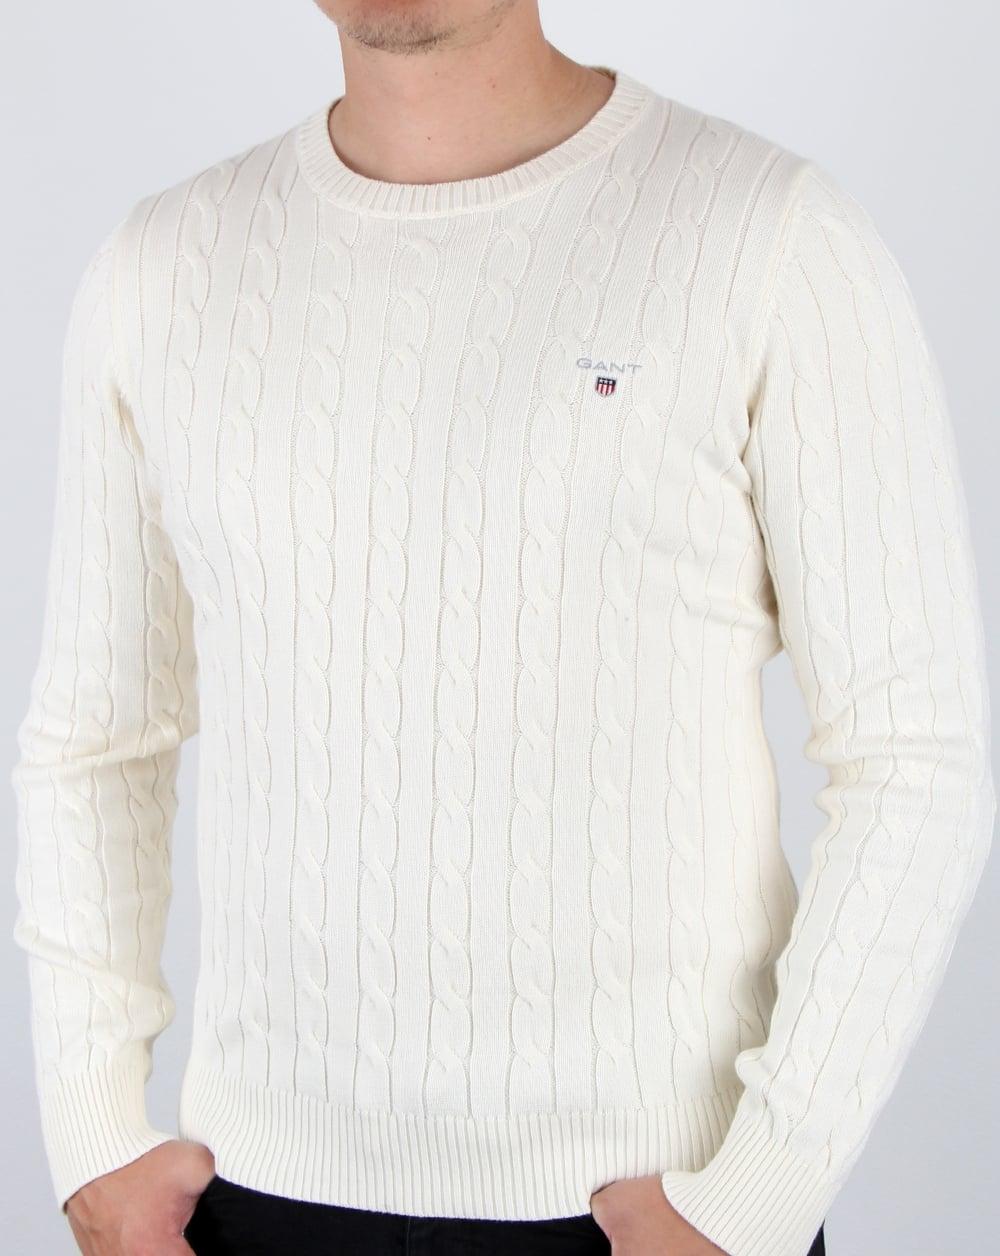 GANT Mens Cotton Wool Crew Jumper